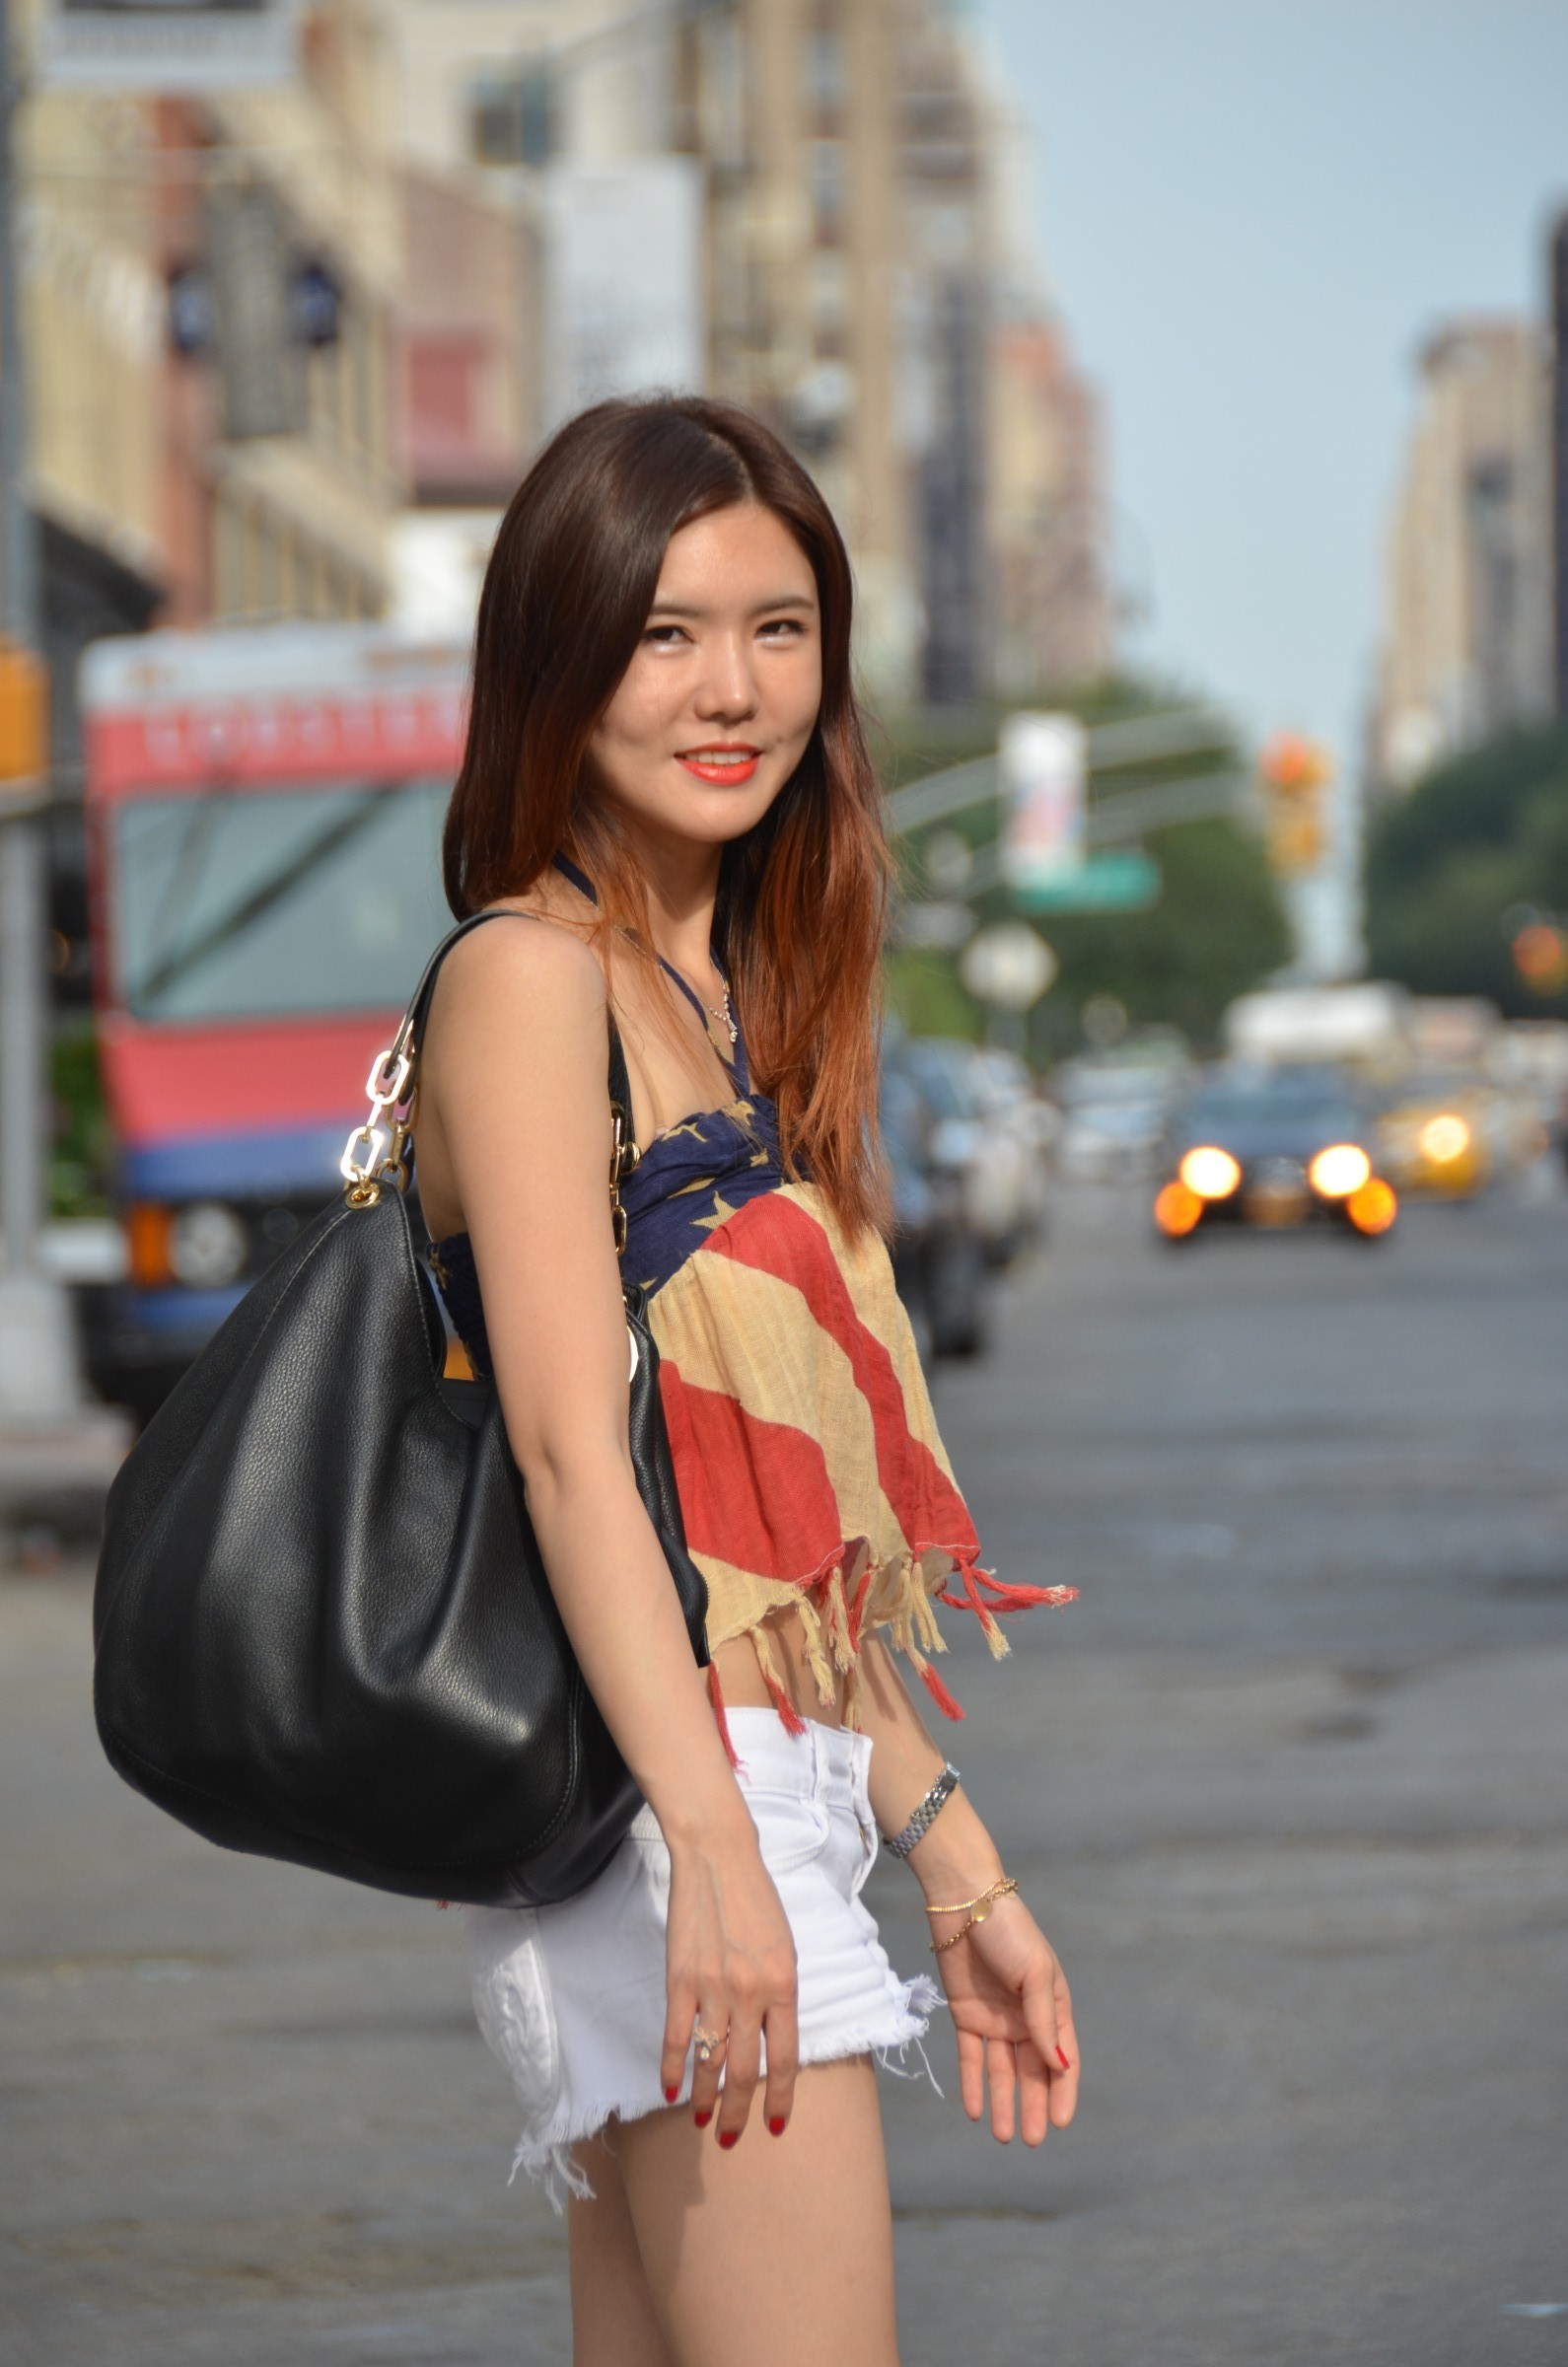 korean girl on NYC street